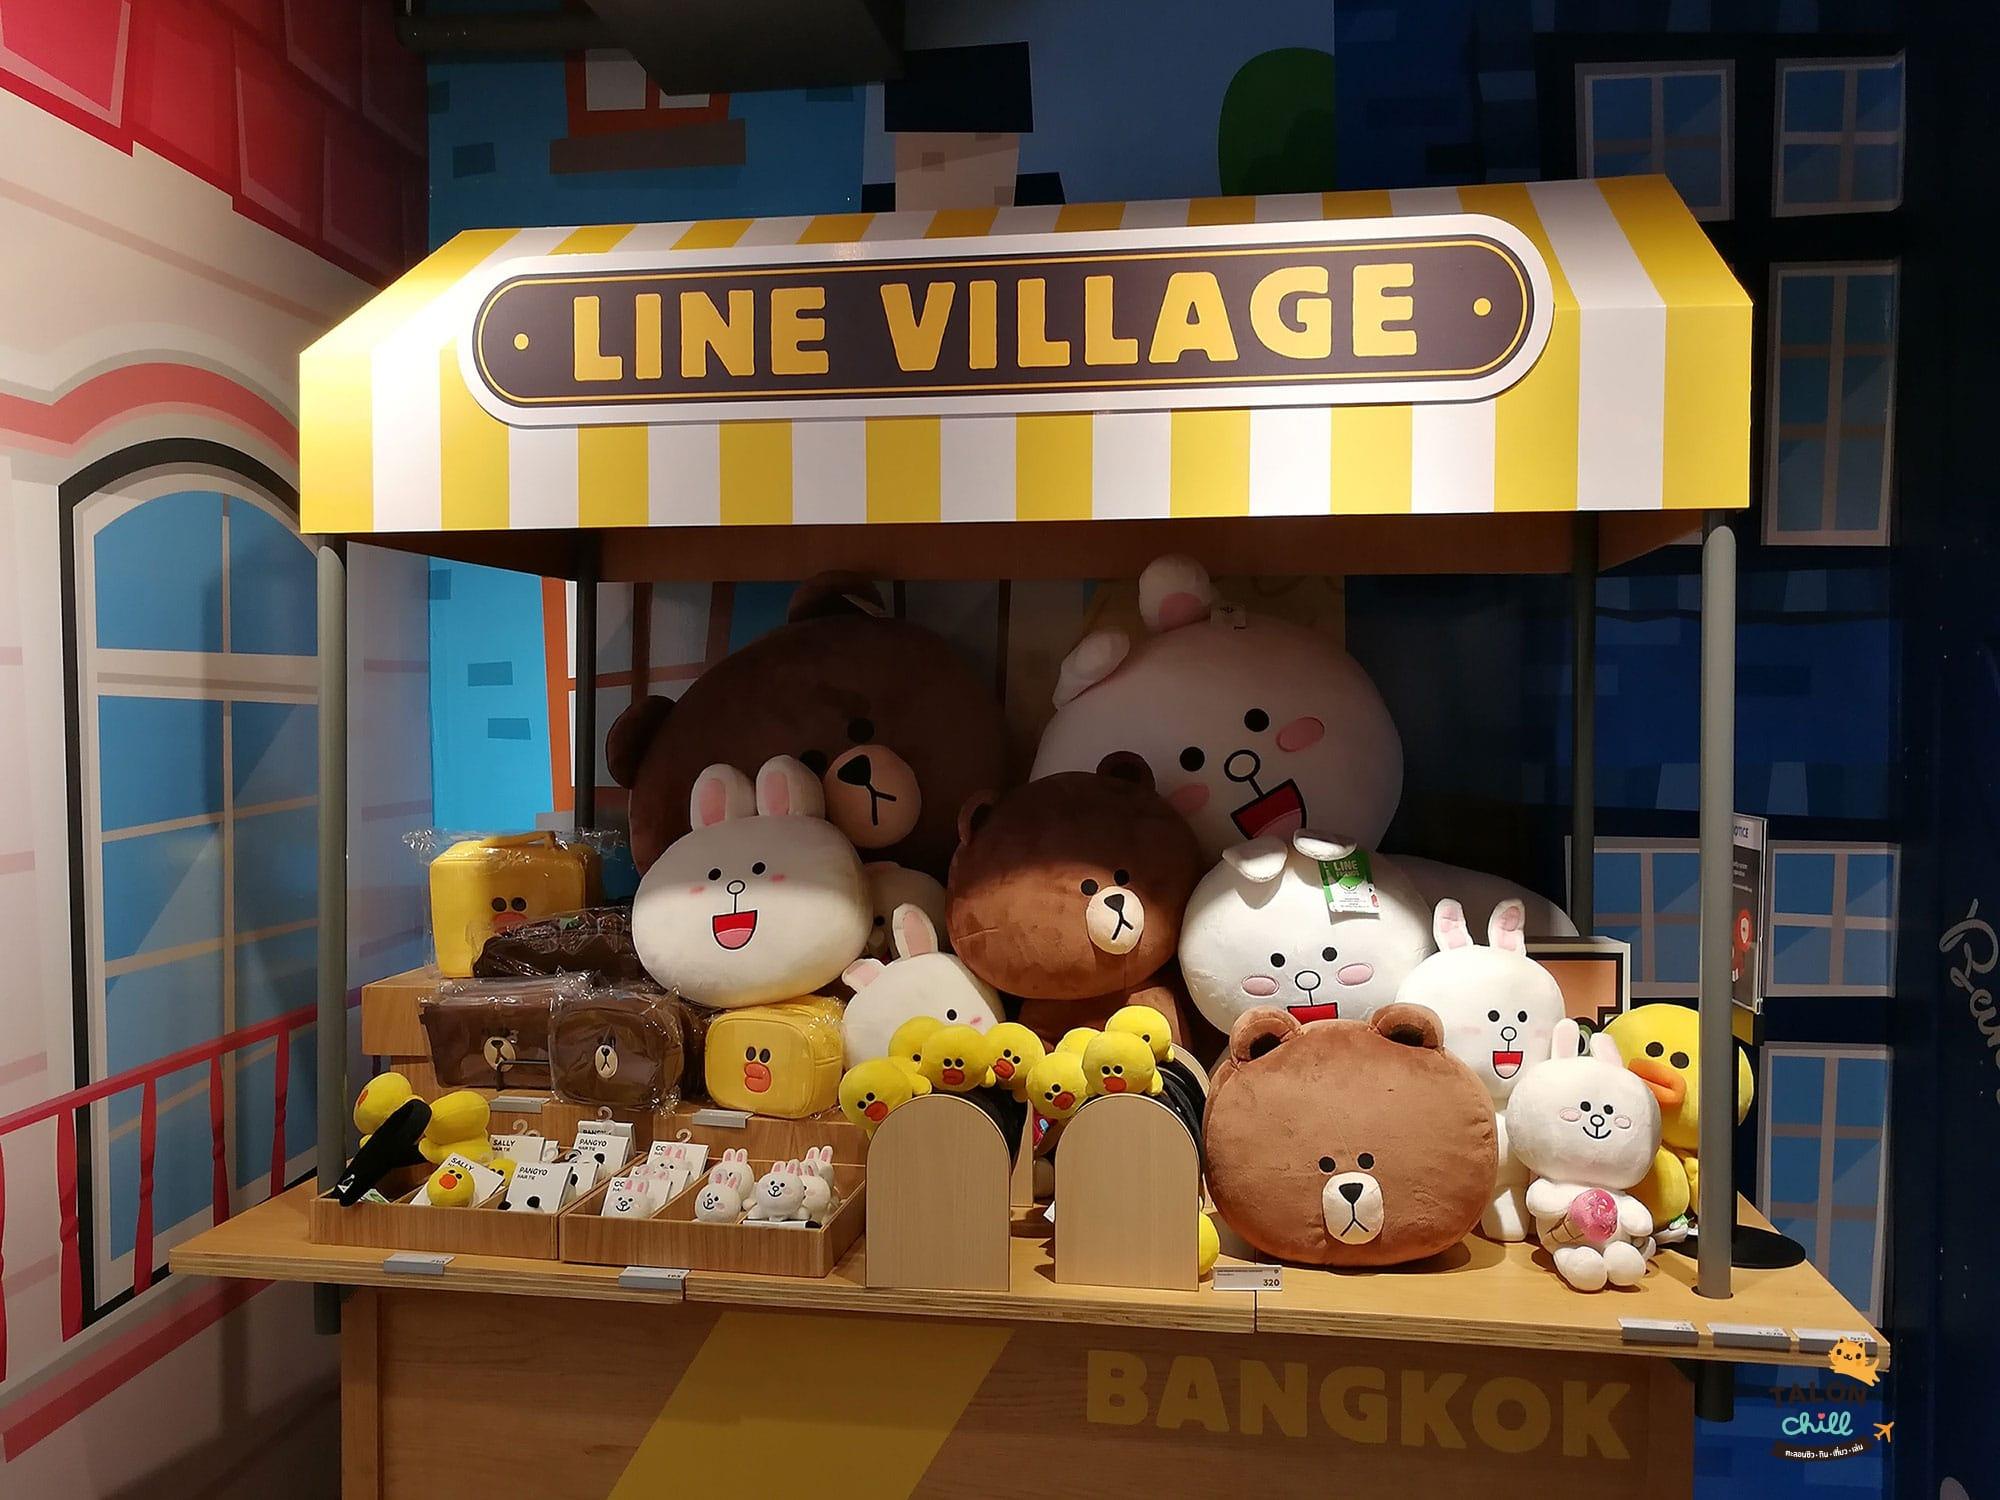 LINE VILLAGE BANGKOK15